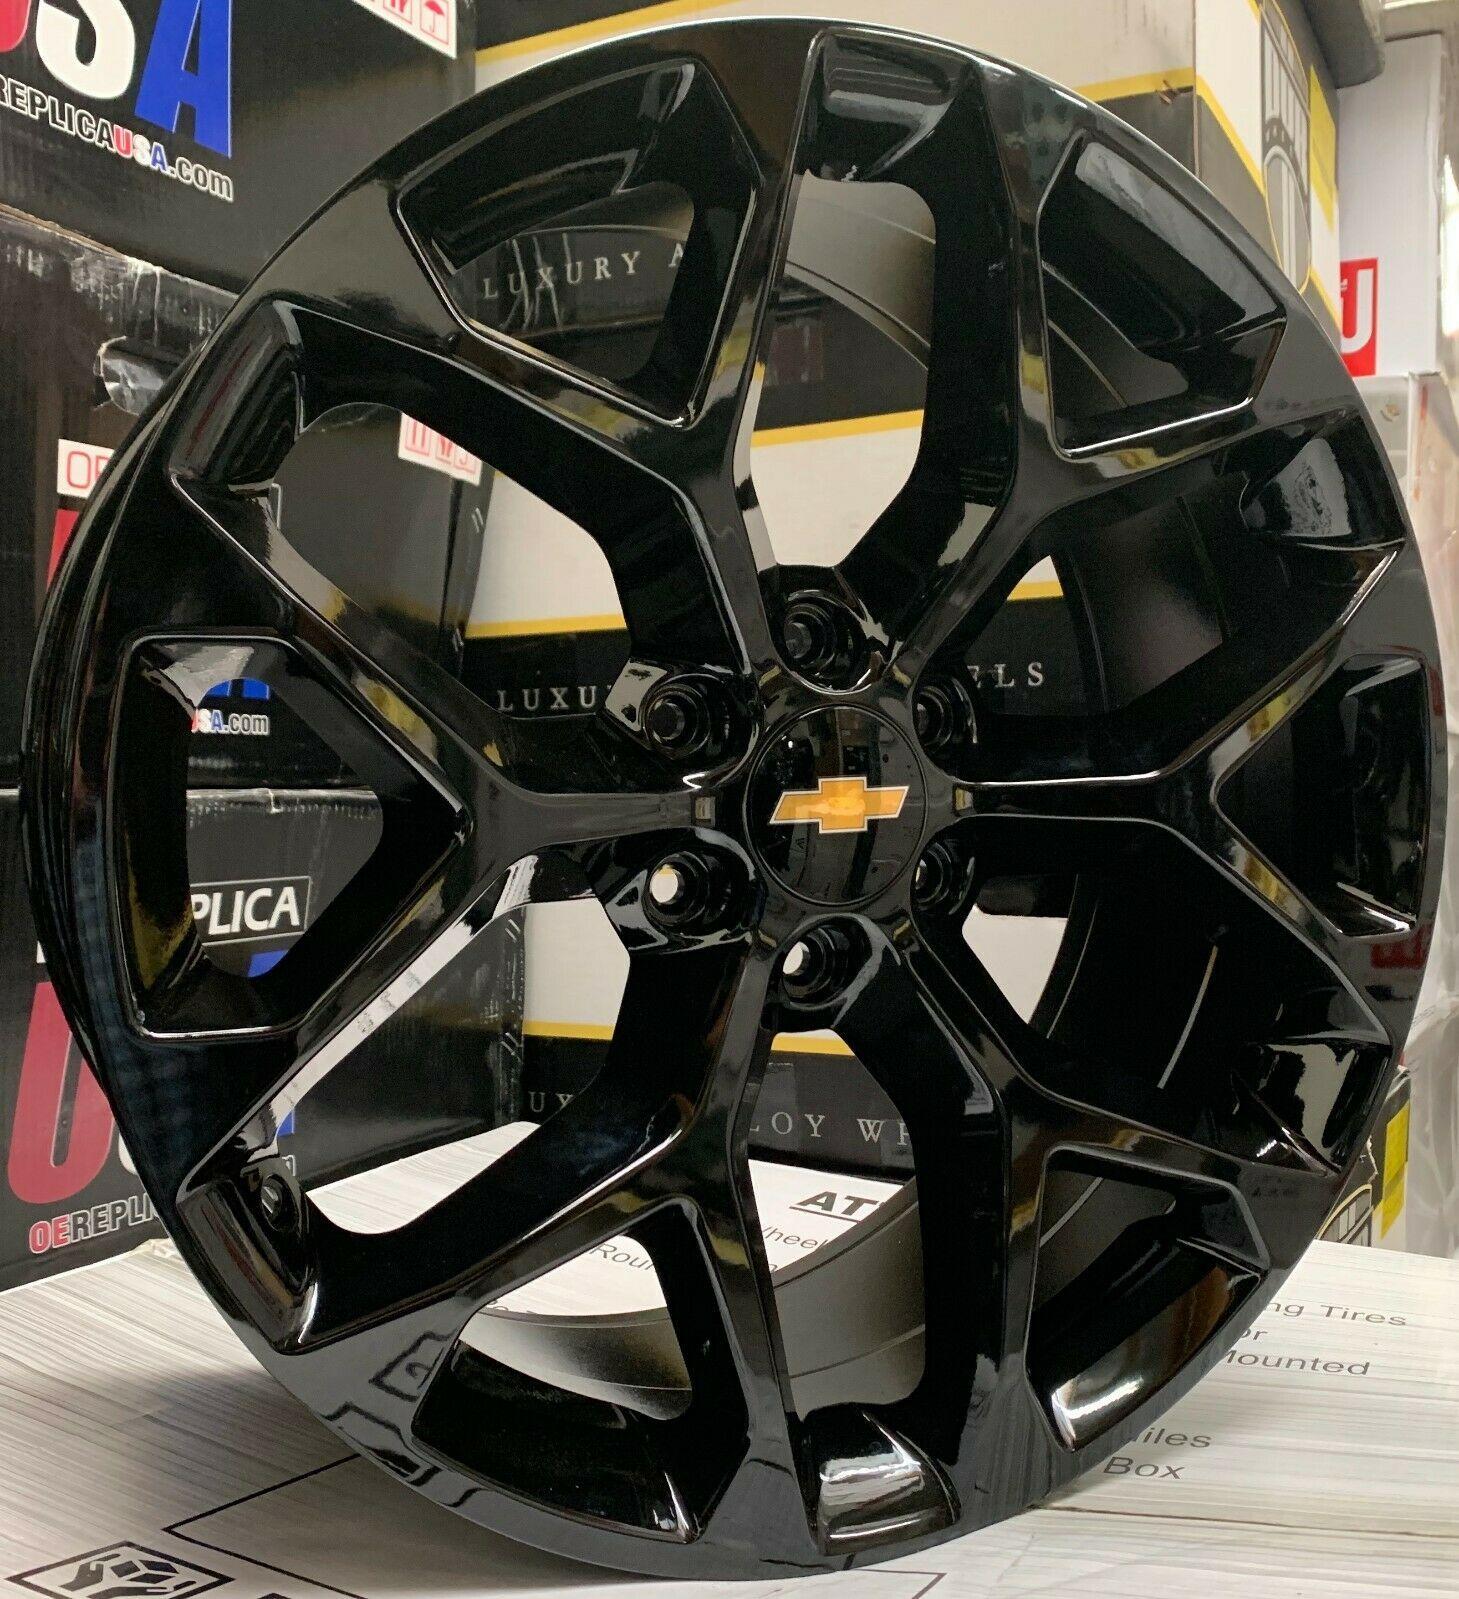 Chevy Silverado Rims And Tires In 2020 Chevy Silverado Rims Chevy Tahoe Chevy Silverado Accessories